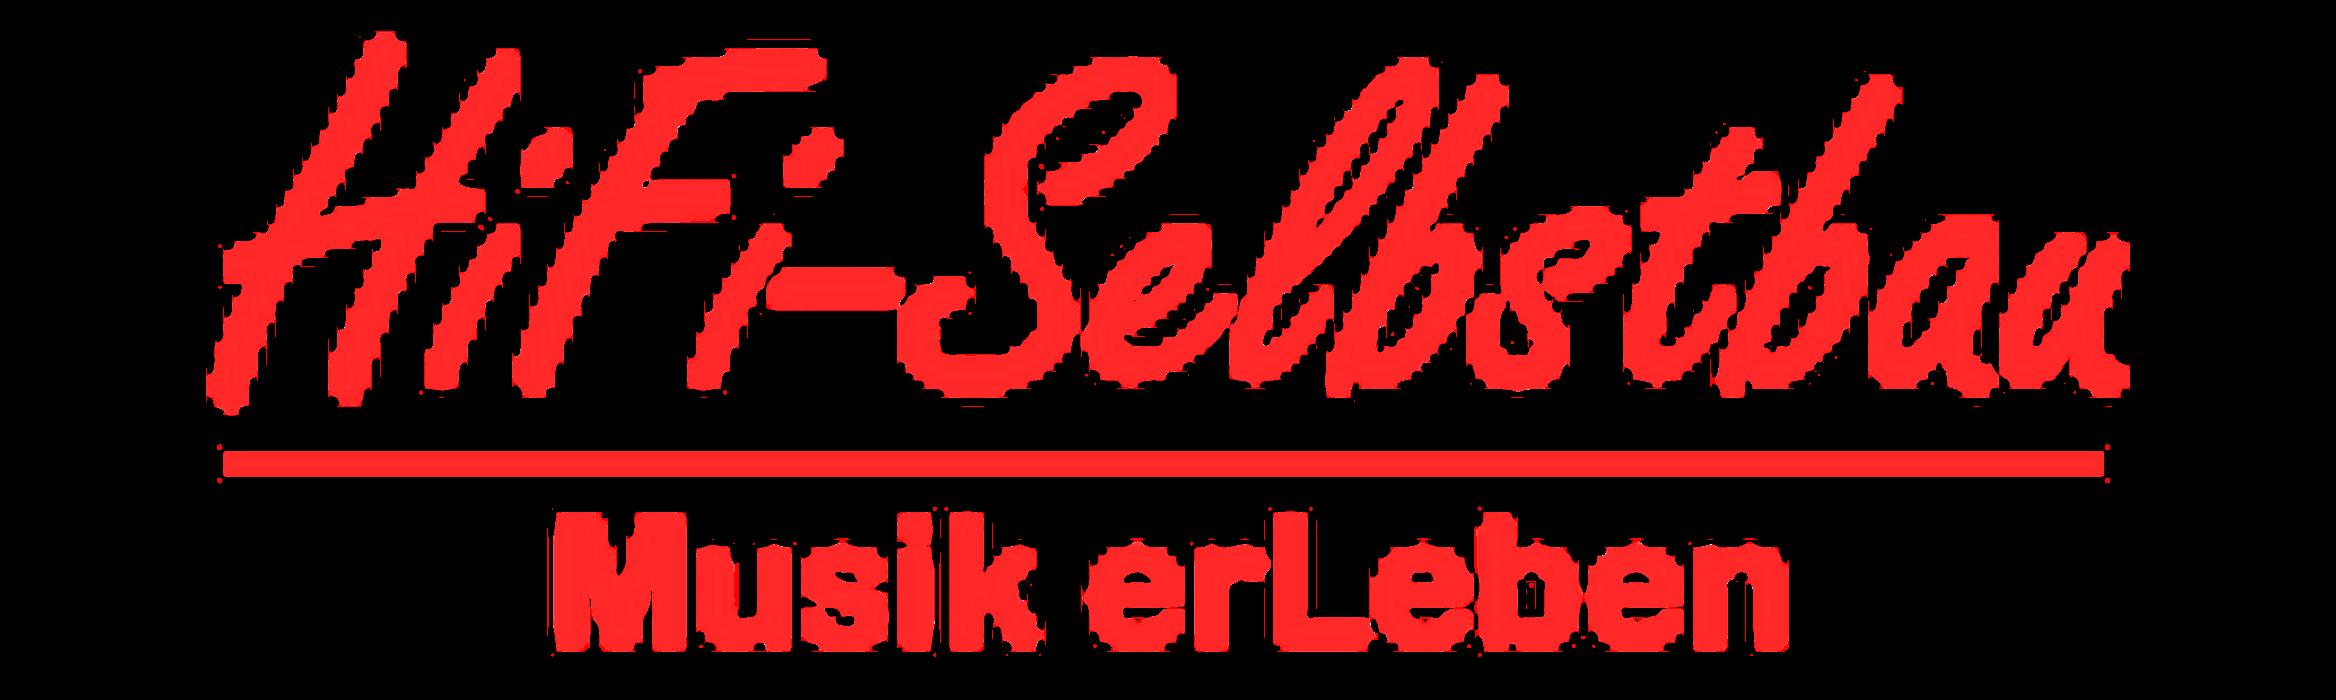 Icy-Medien GmbH